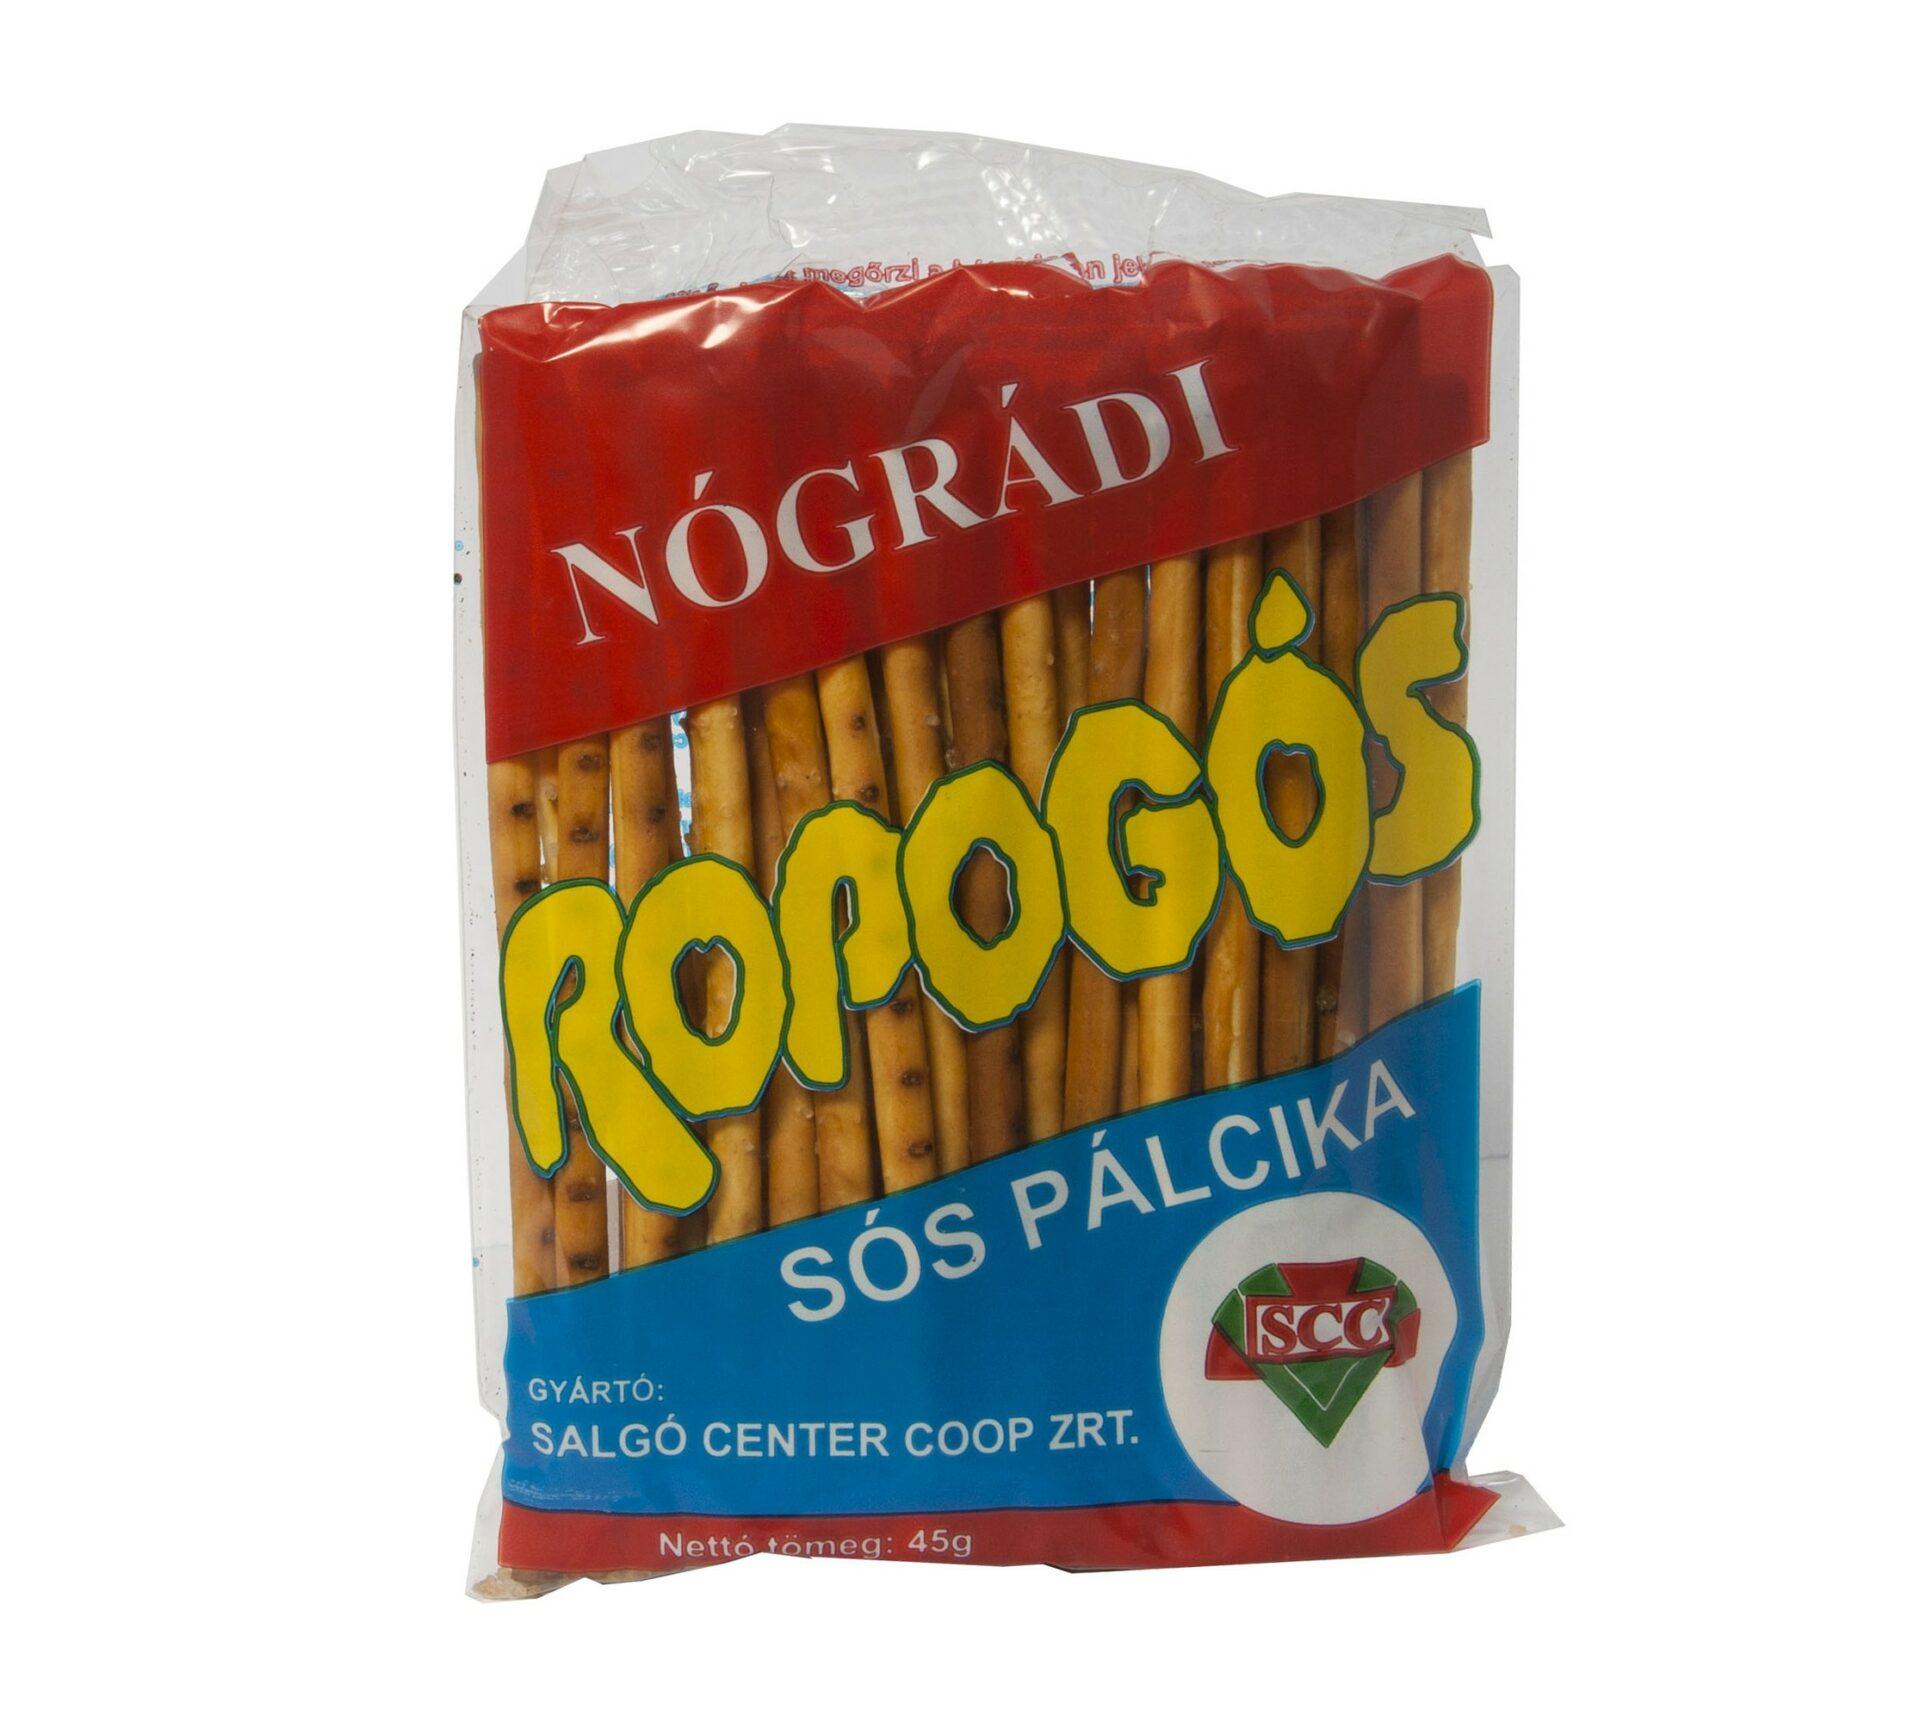 Nógrádi Sós pálcika, Ropi 50g – Salty sticks